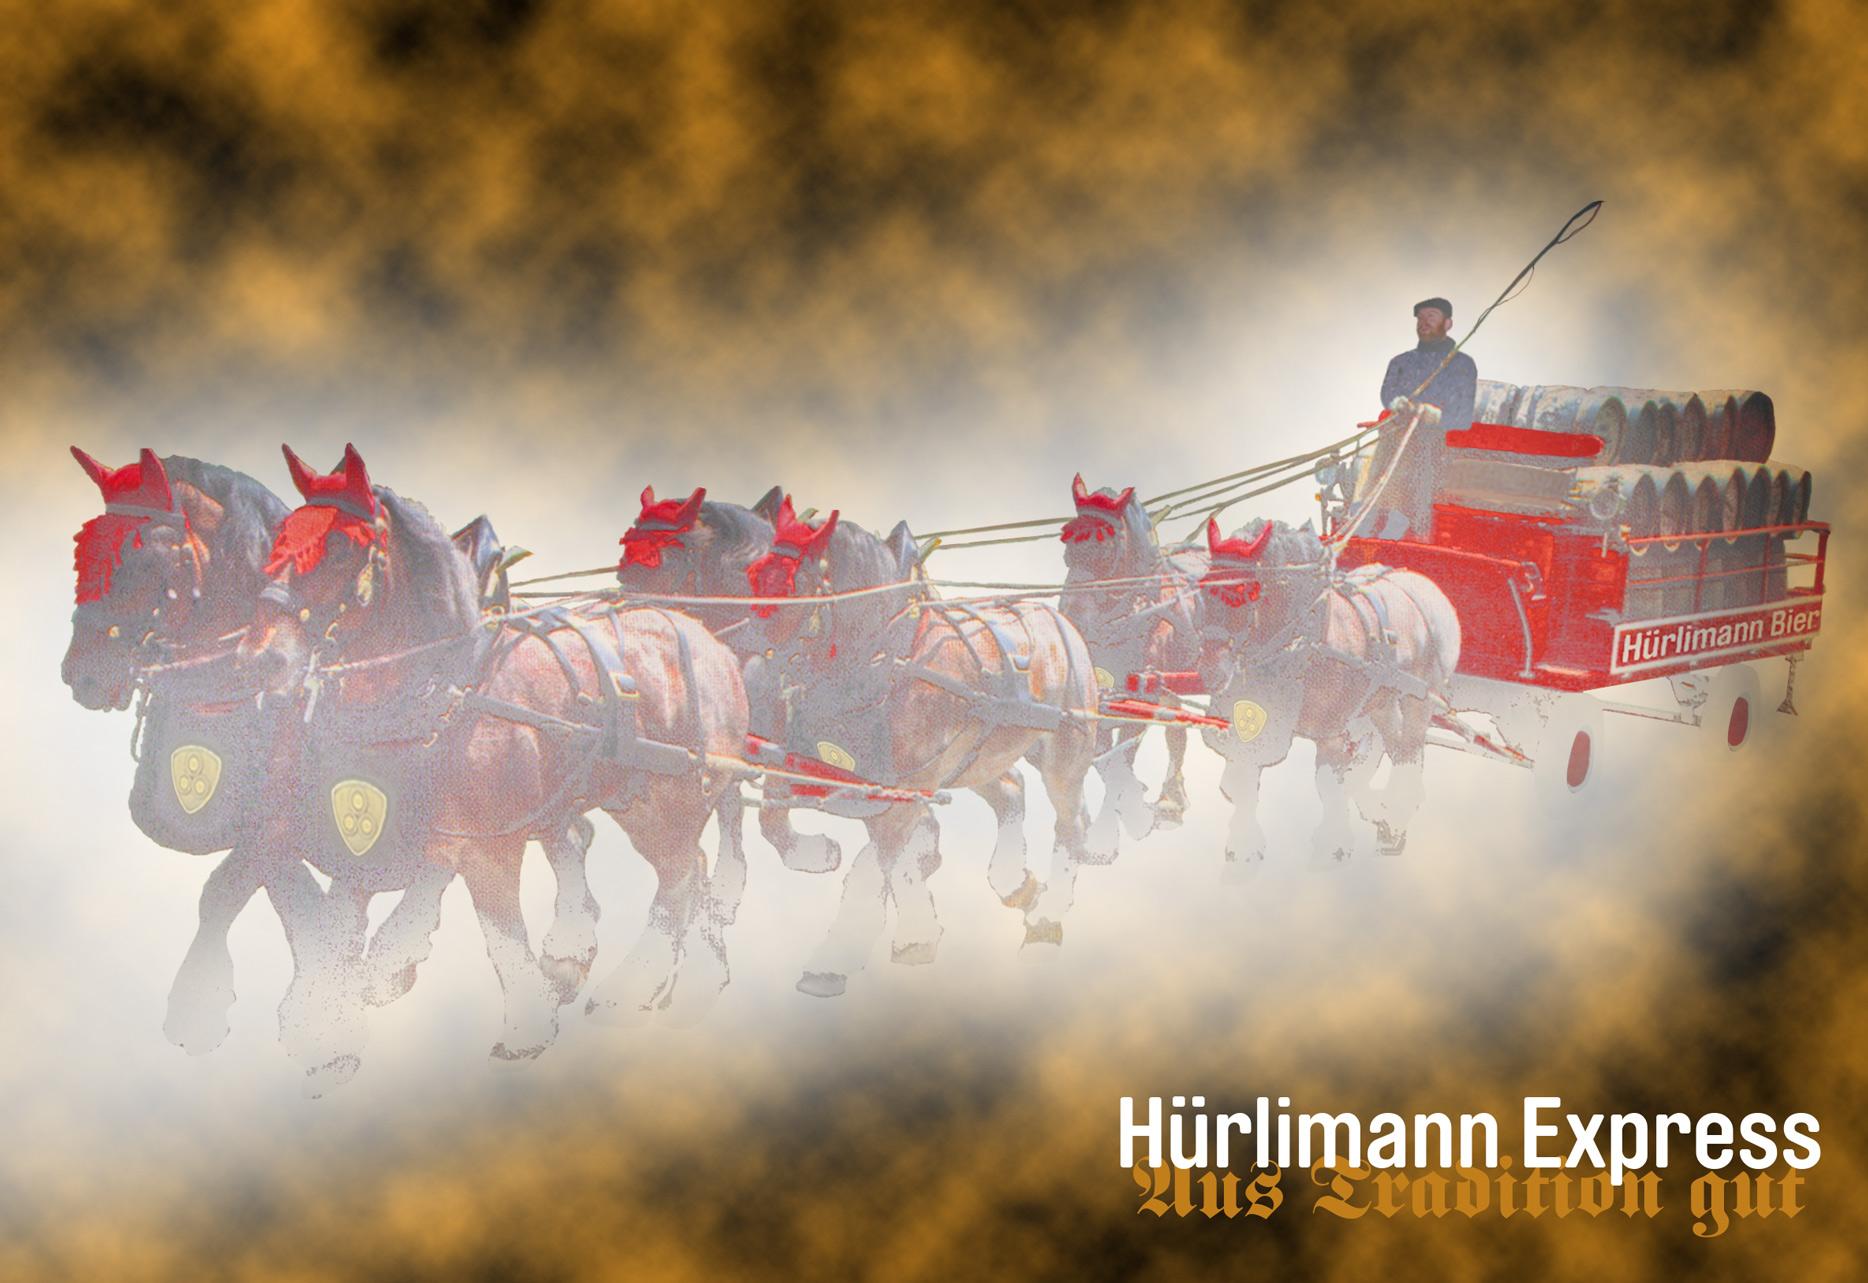 Hürlimann Express, Feldschlösschen, Pferde, Swiss Brew, Swiss Beer, Horses Brewing Company, Brauereigespann, Oktoberfest, Kutsche Schweiz,  Bier Express, Beer Express,